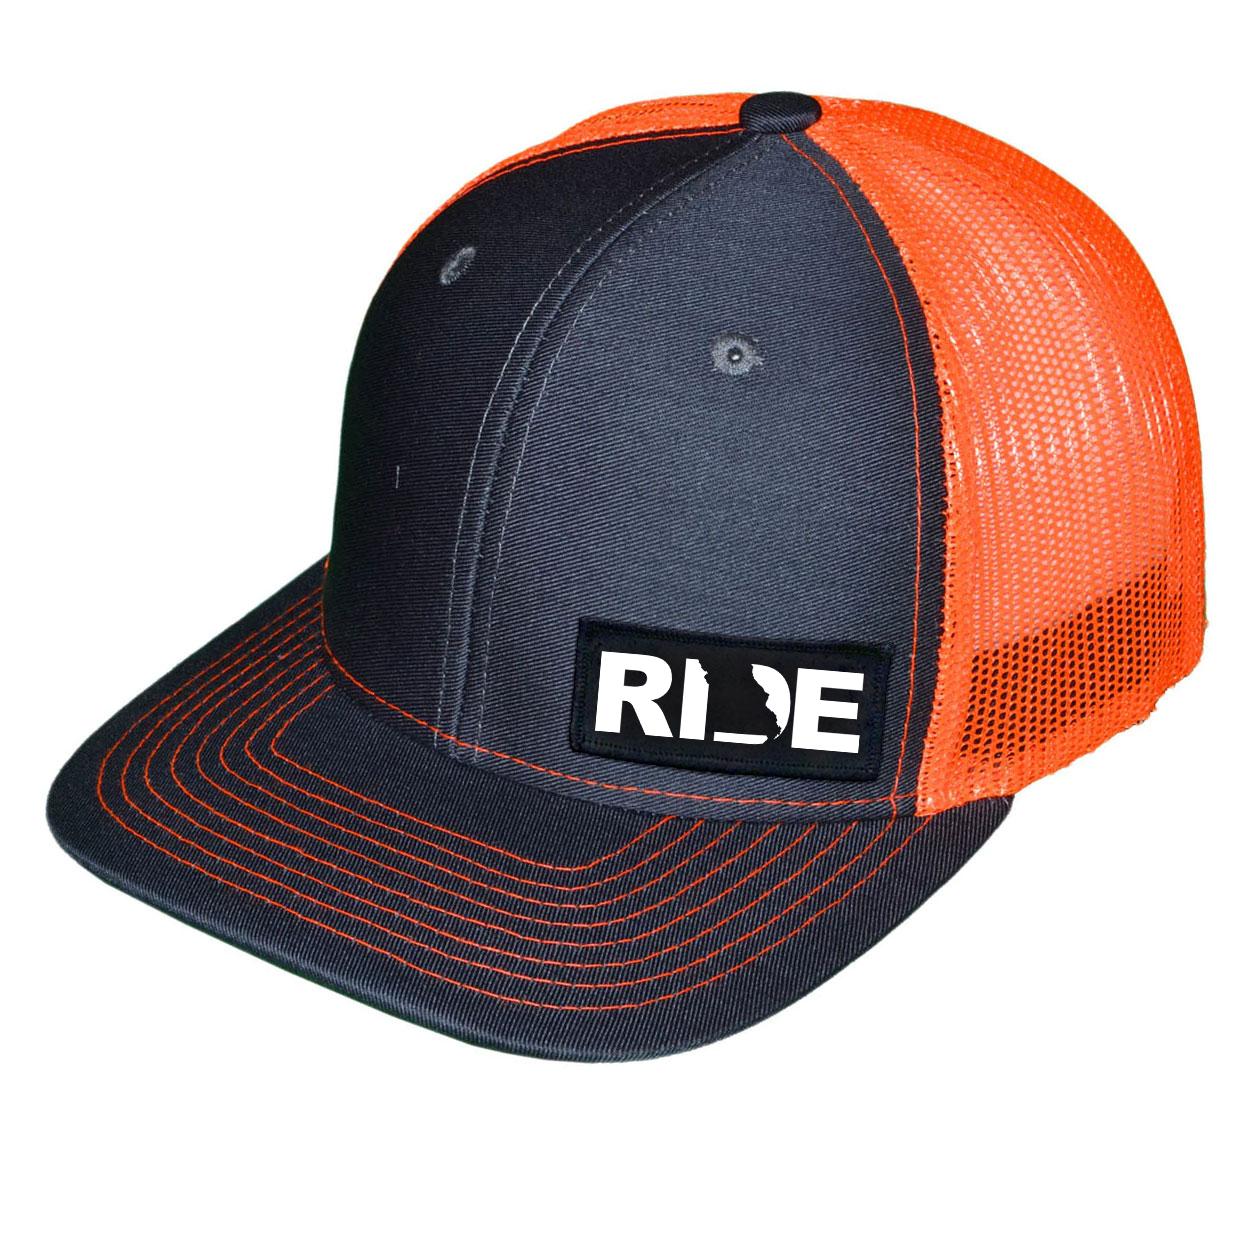 Ride Missouri Night Out Woven Patch Snapback Trucker Hat Dark Gray/Orange (White Logo)